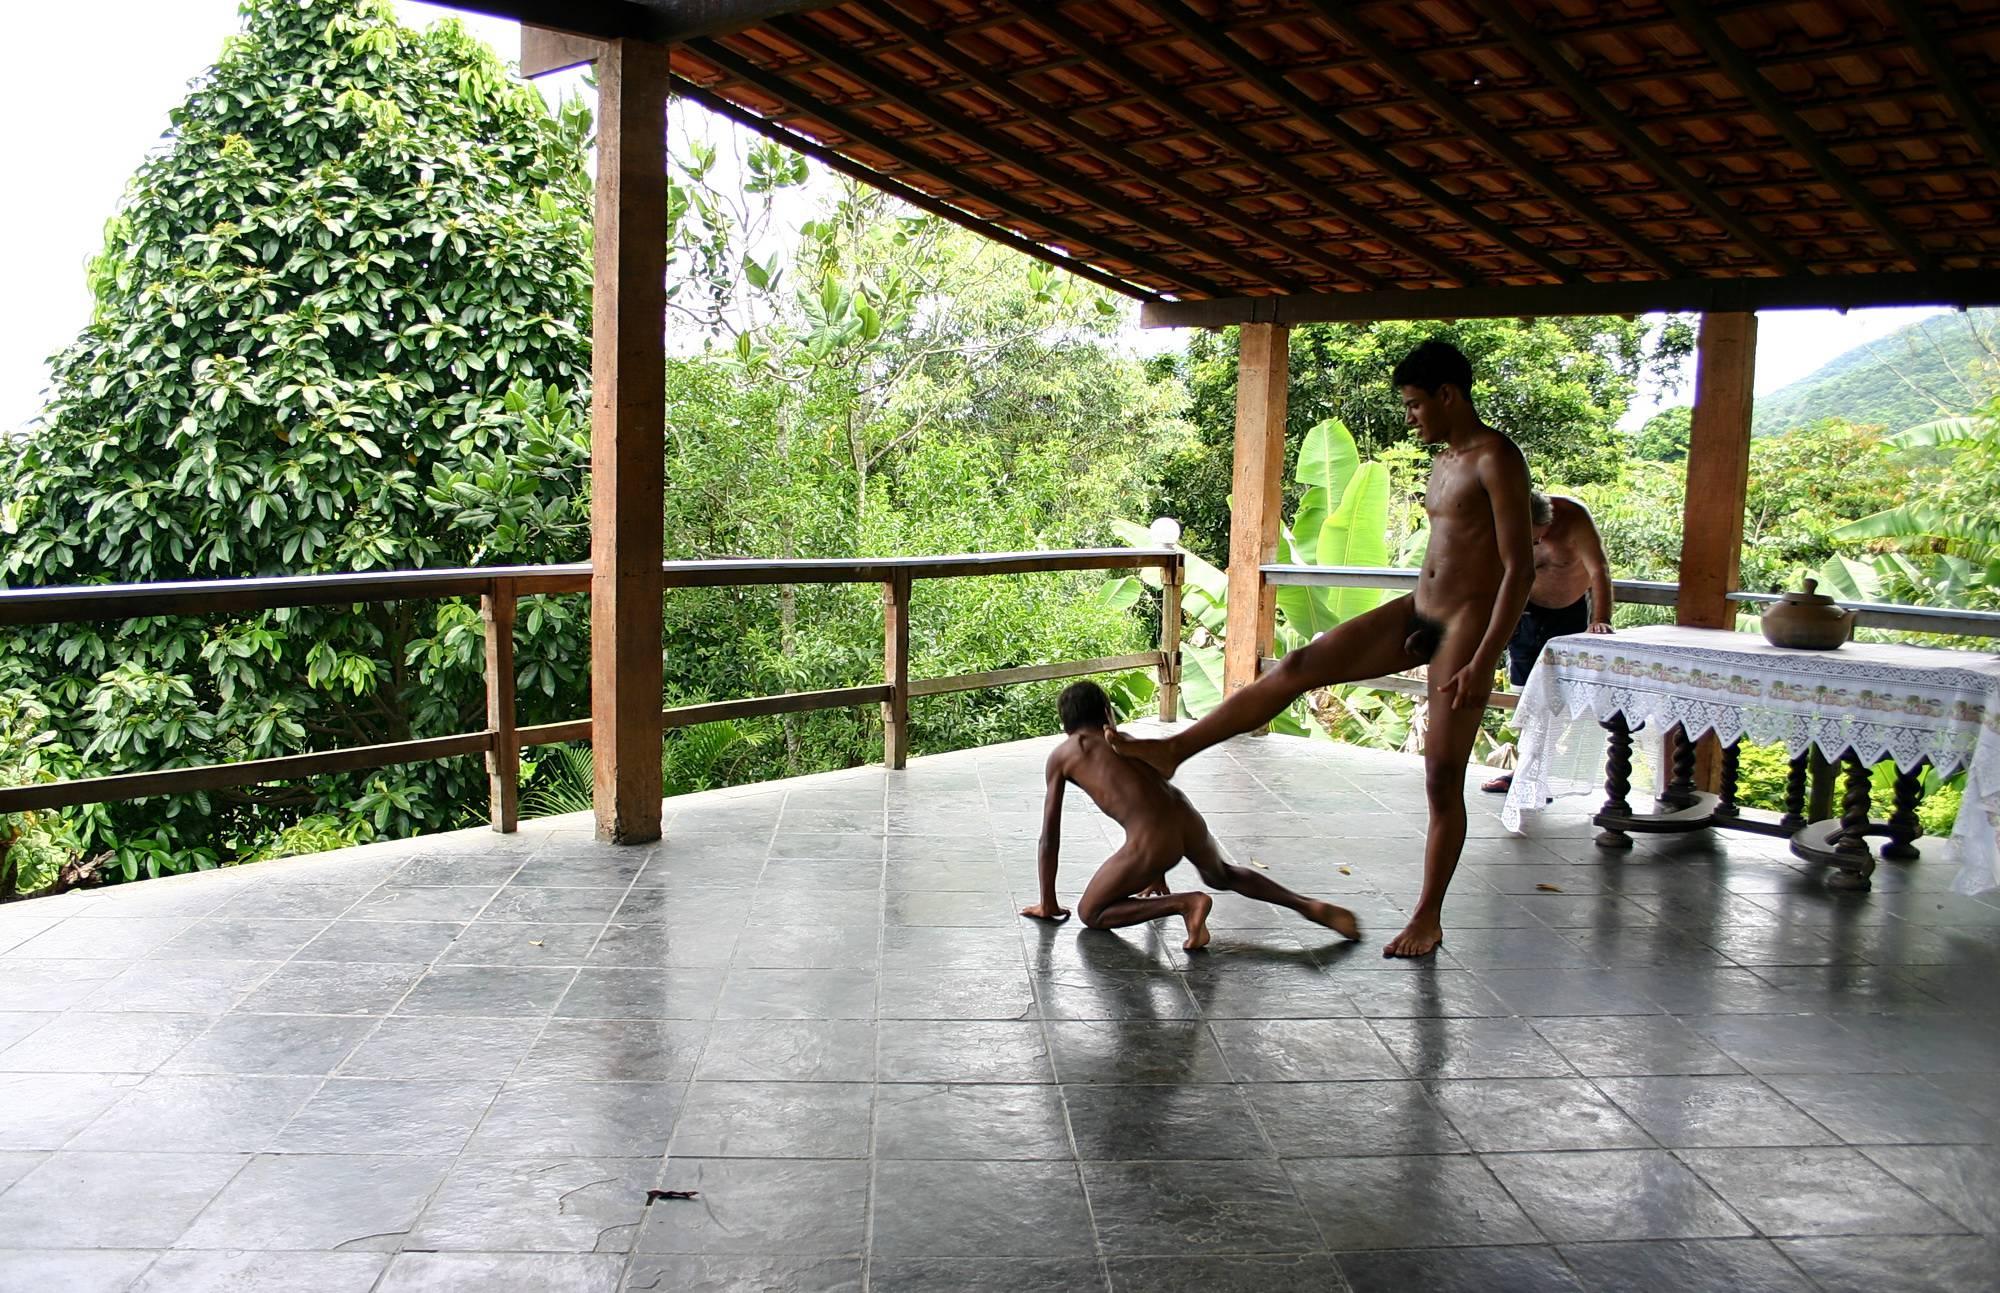 Nudist Gallery Sheds Dance Partnership - 1